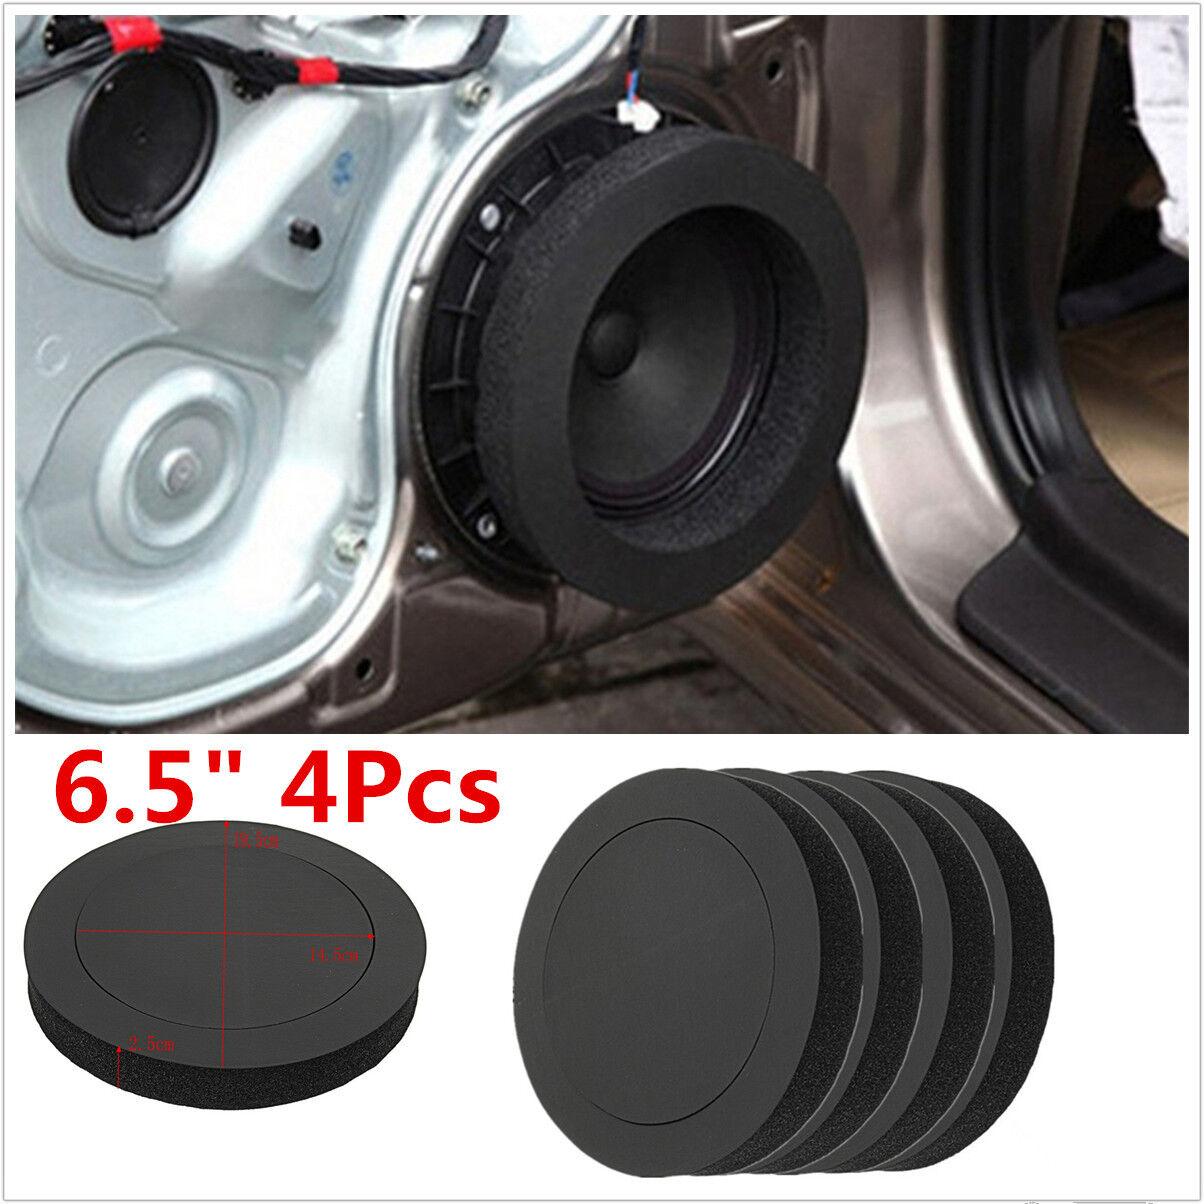 "Car Parts - 4x Black 6.5"" FAST Foam Rings Car Door Speaker Enhancer System Kit Universal"